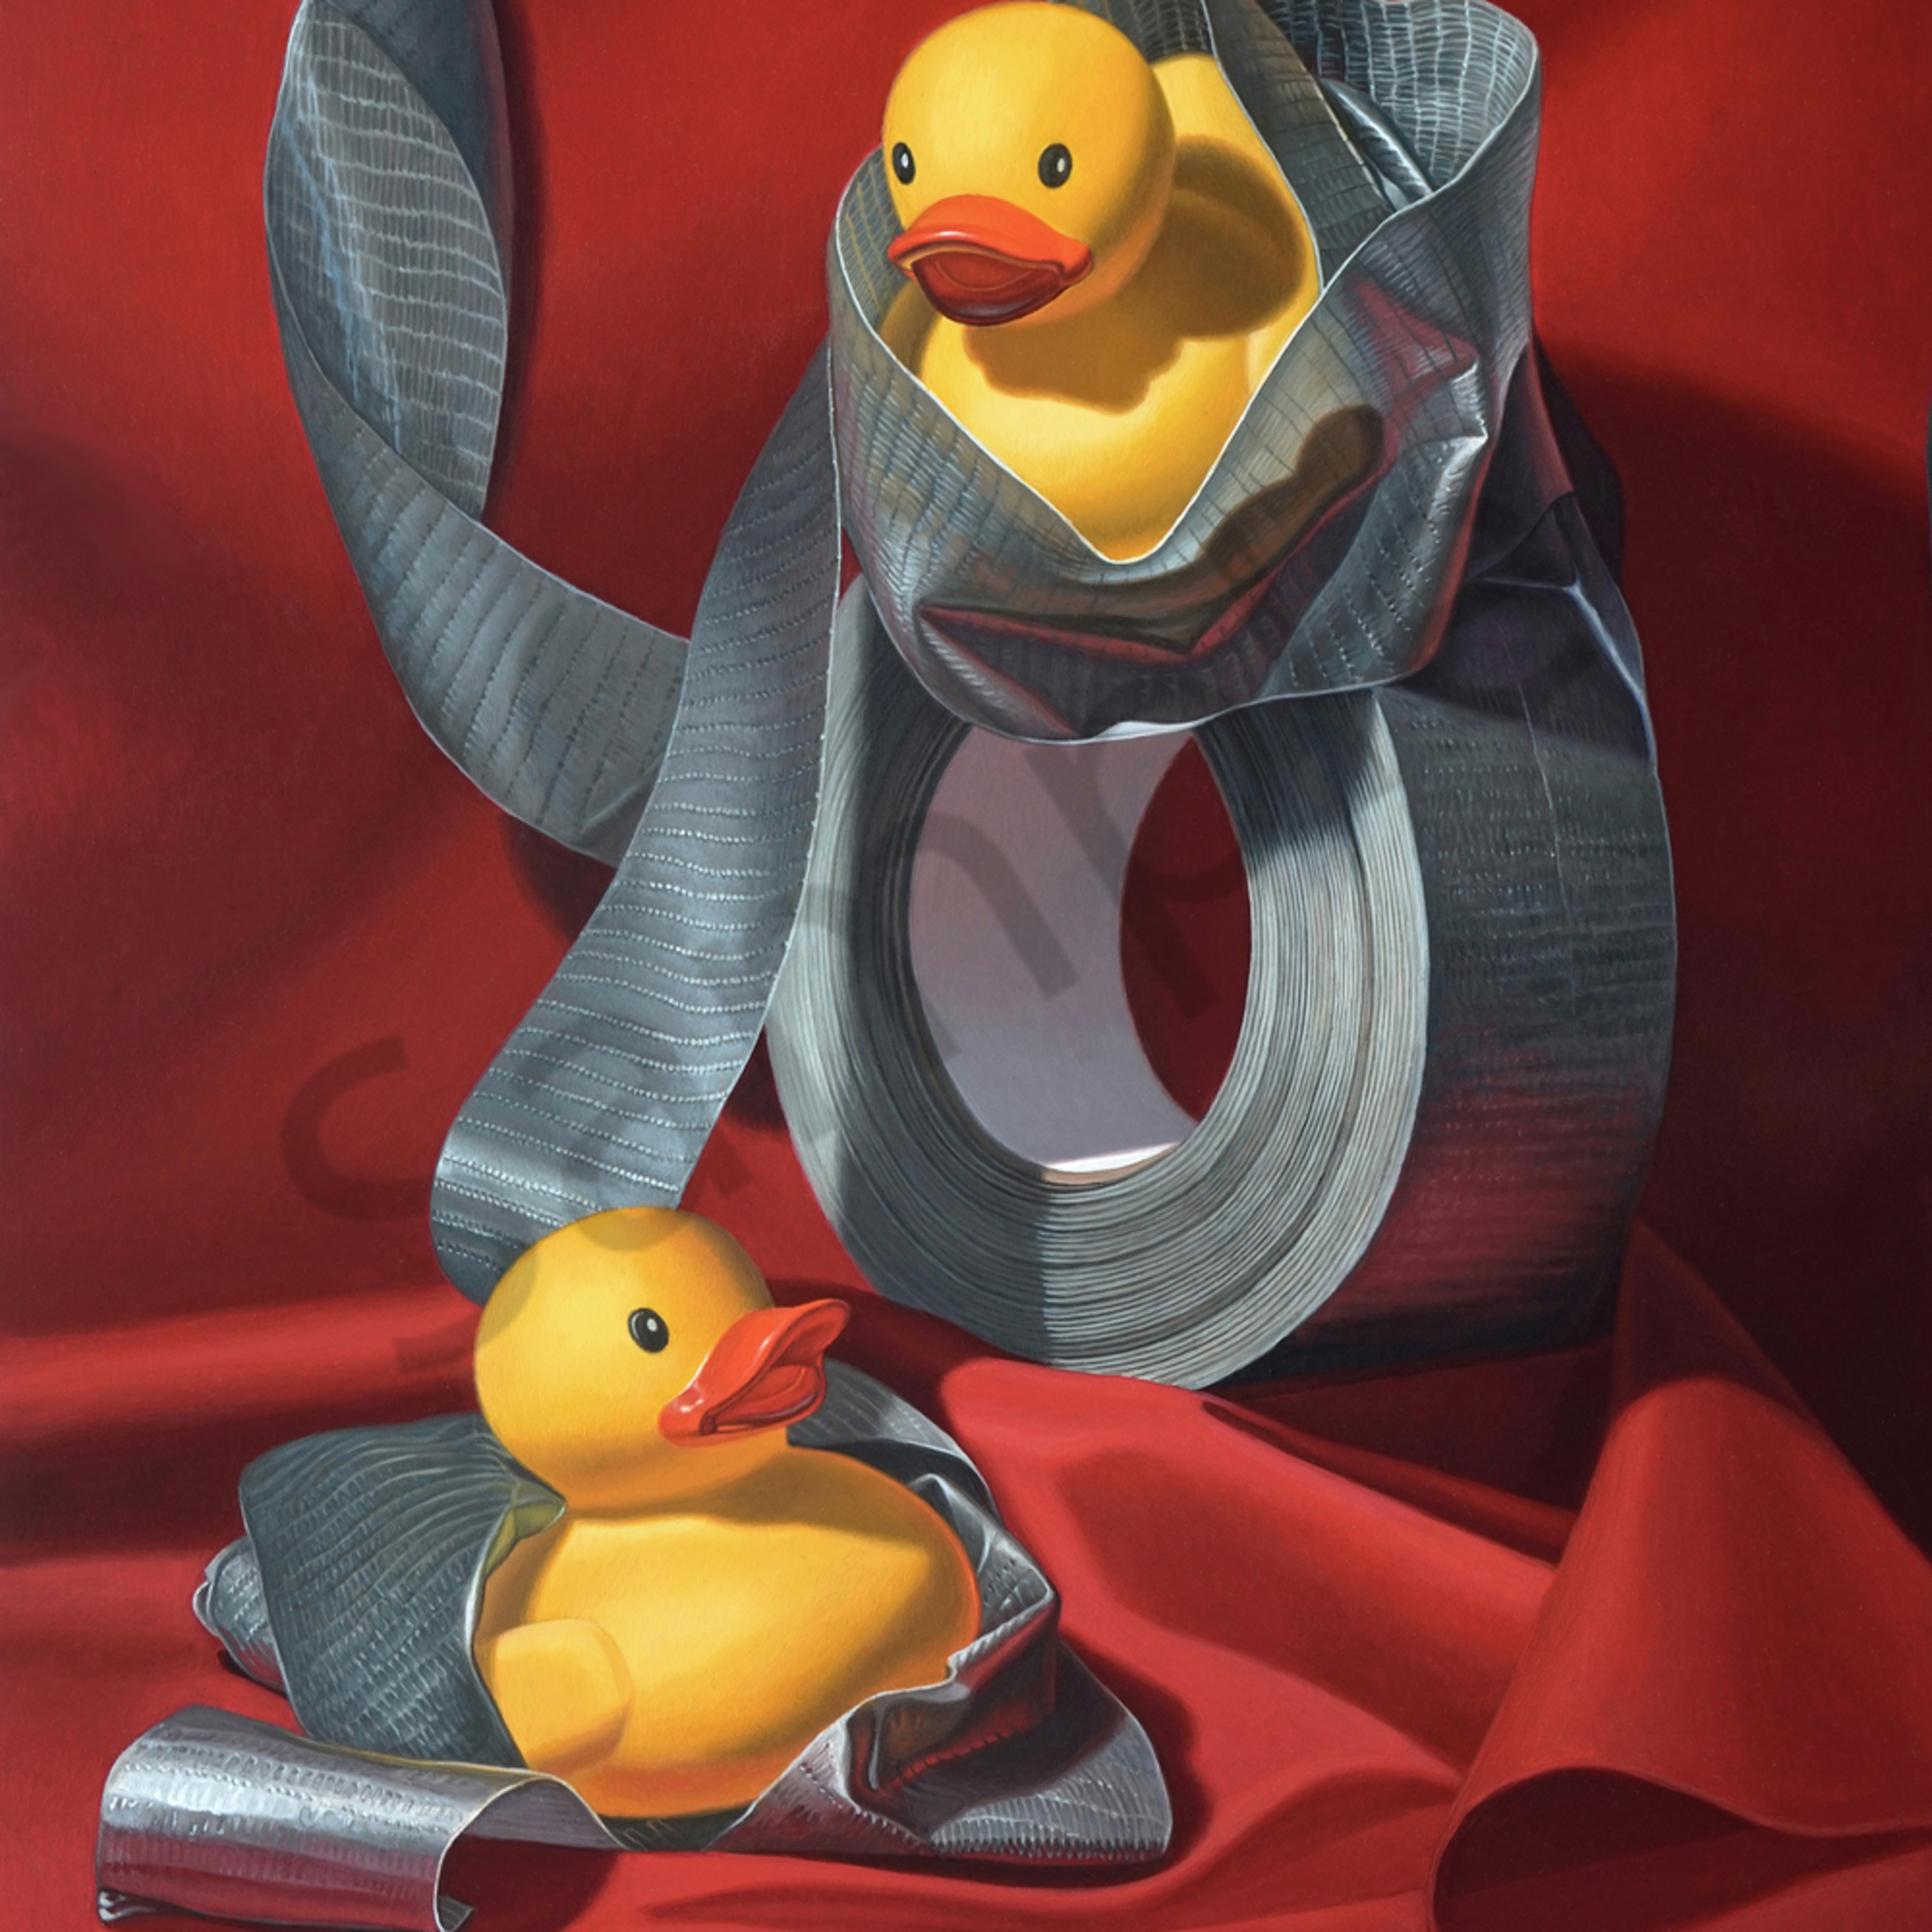 Duck tape 32x40 print file v5uwz7